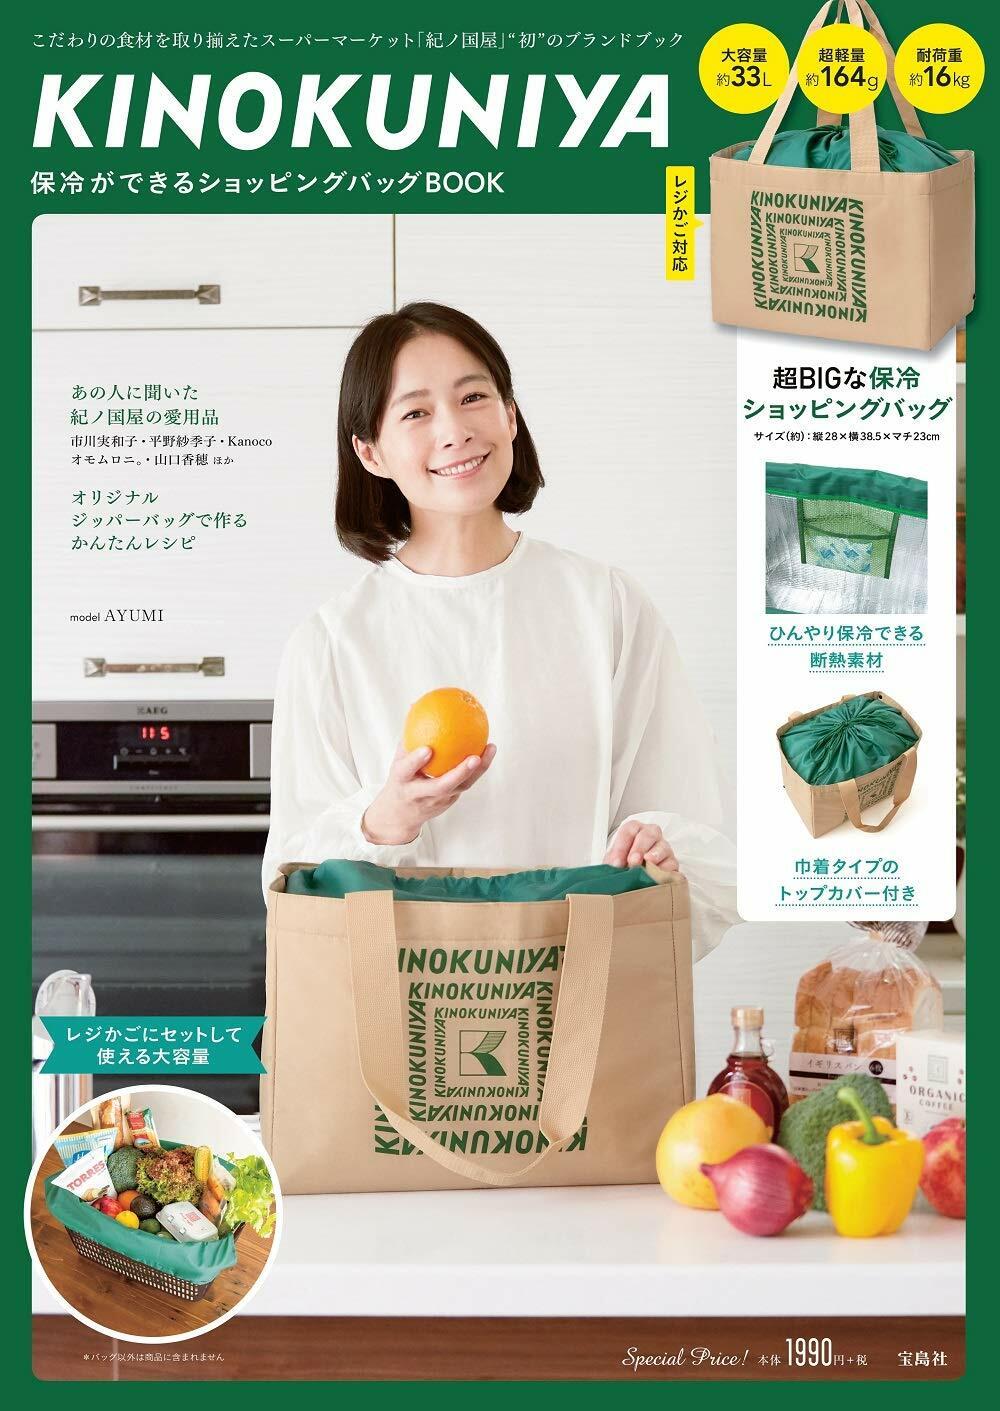 KINOKUNIYA 保冷ができるレジかごバッグBOOK (ブランドブック)